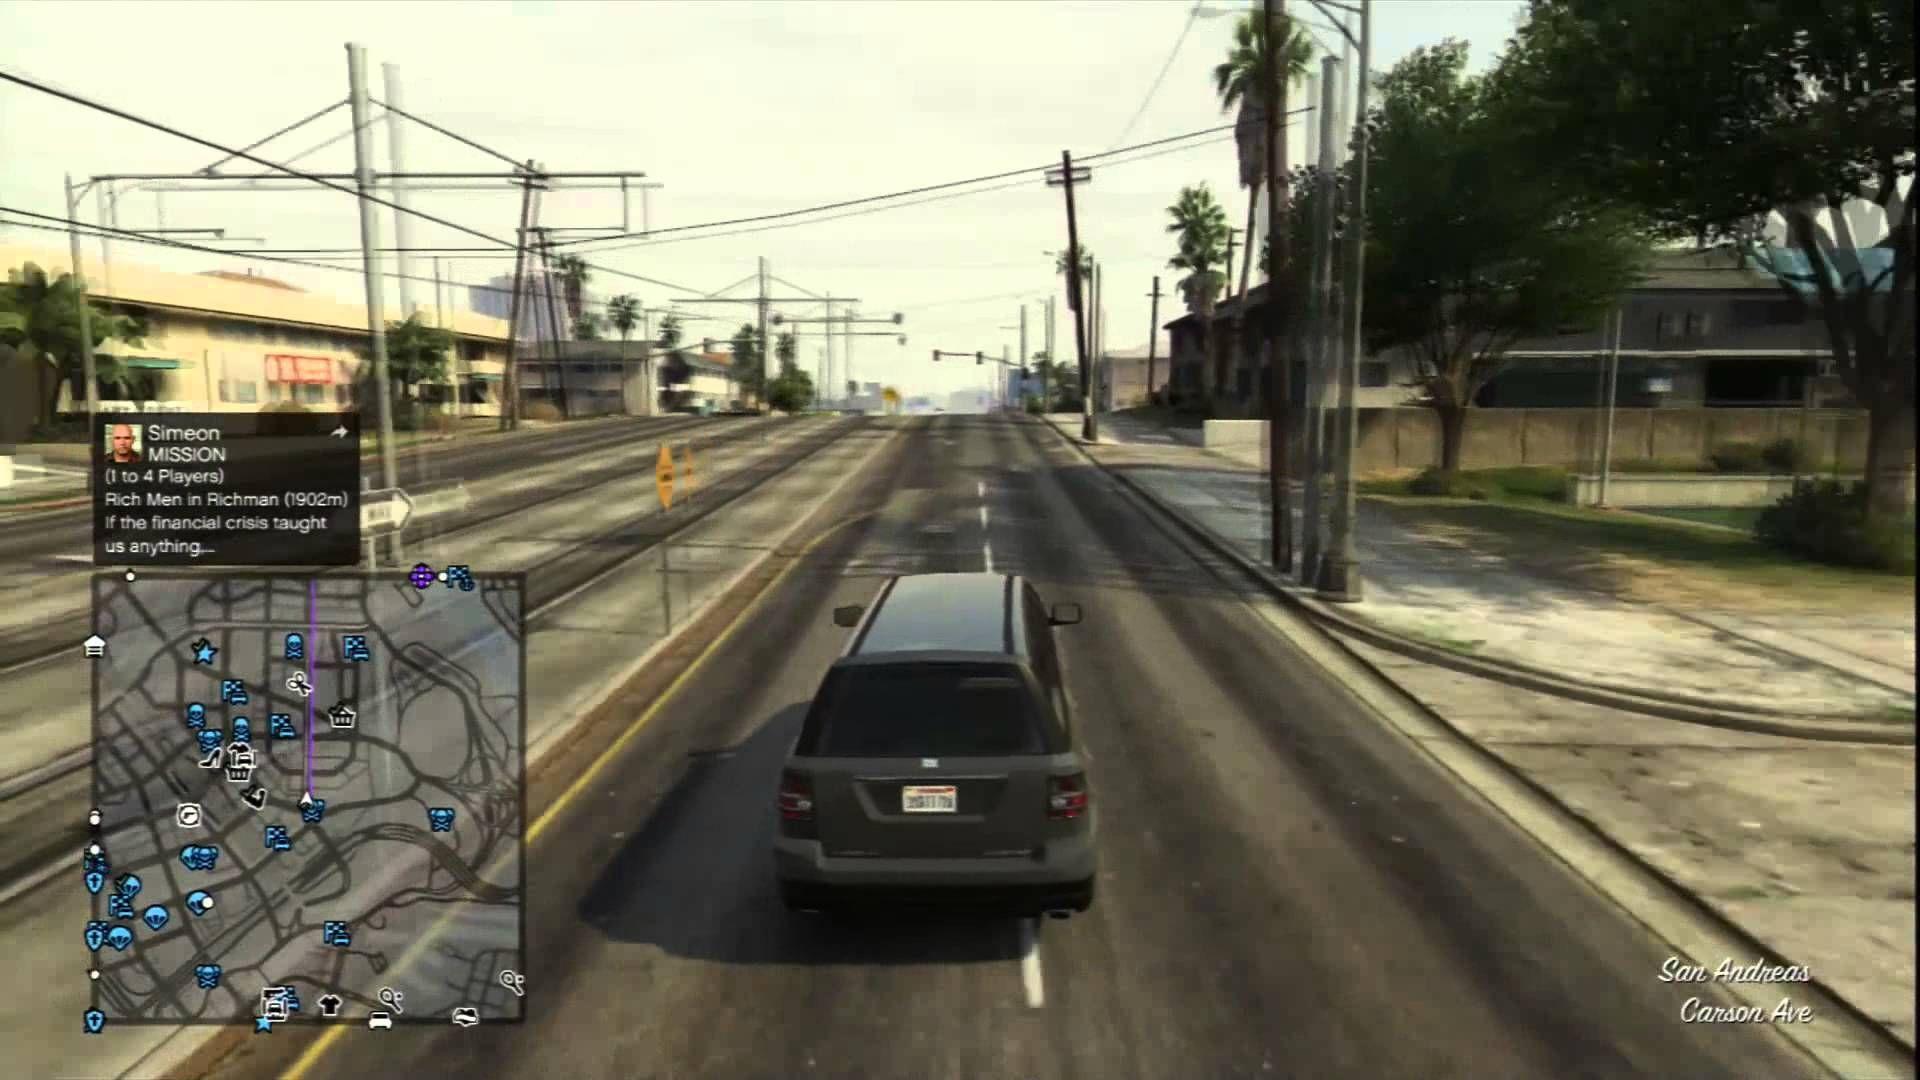 gta 5 find cars for simeon